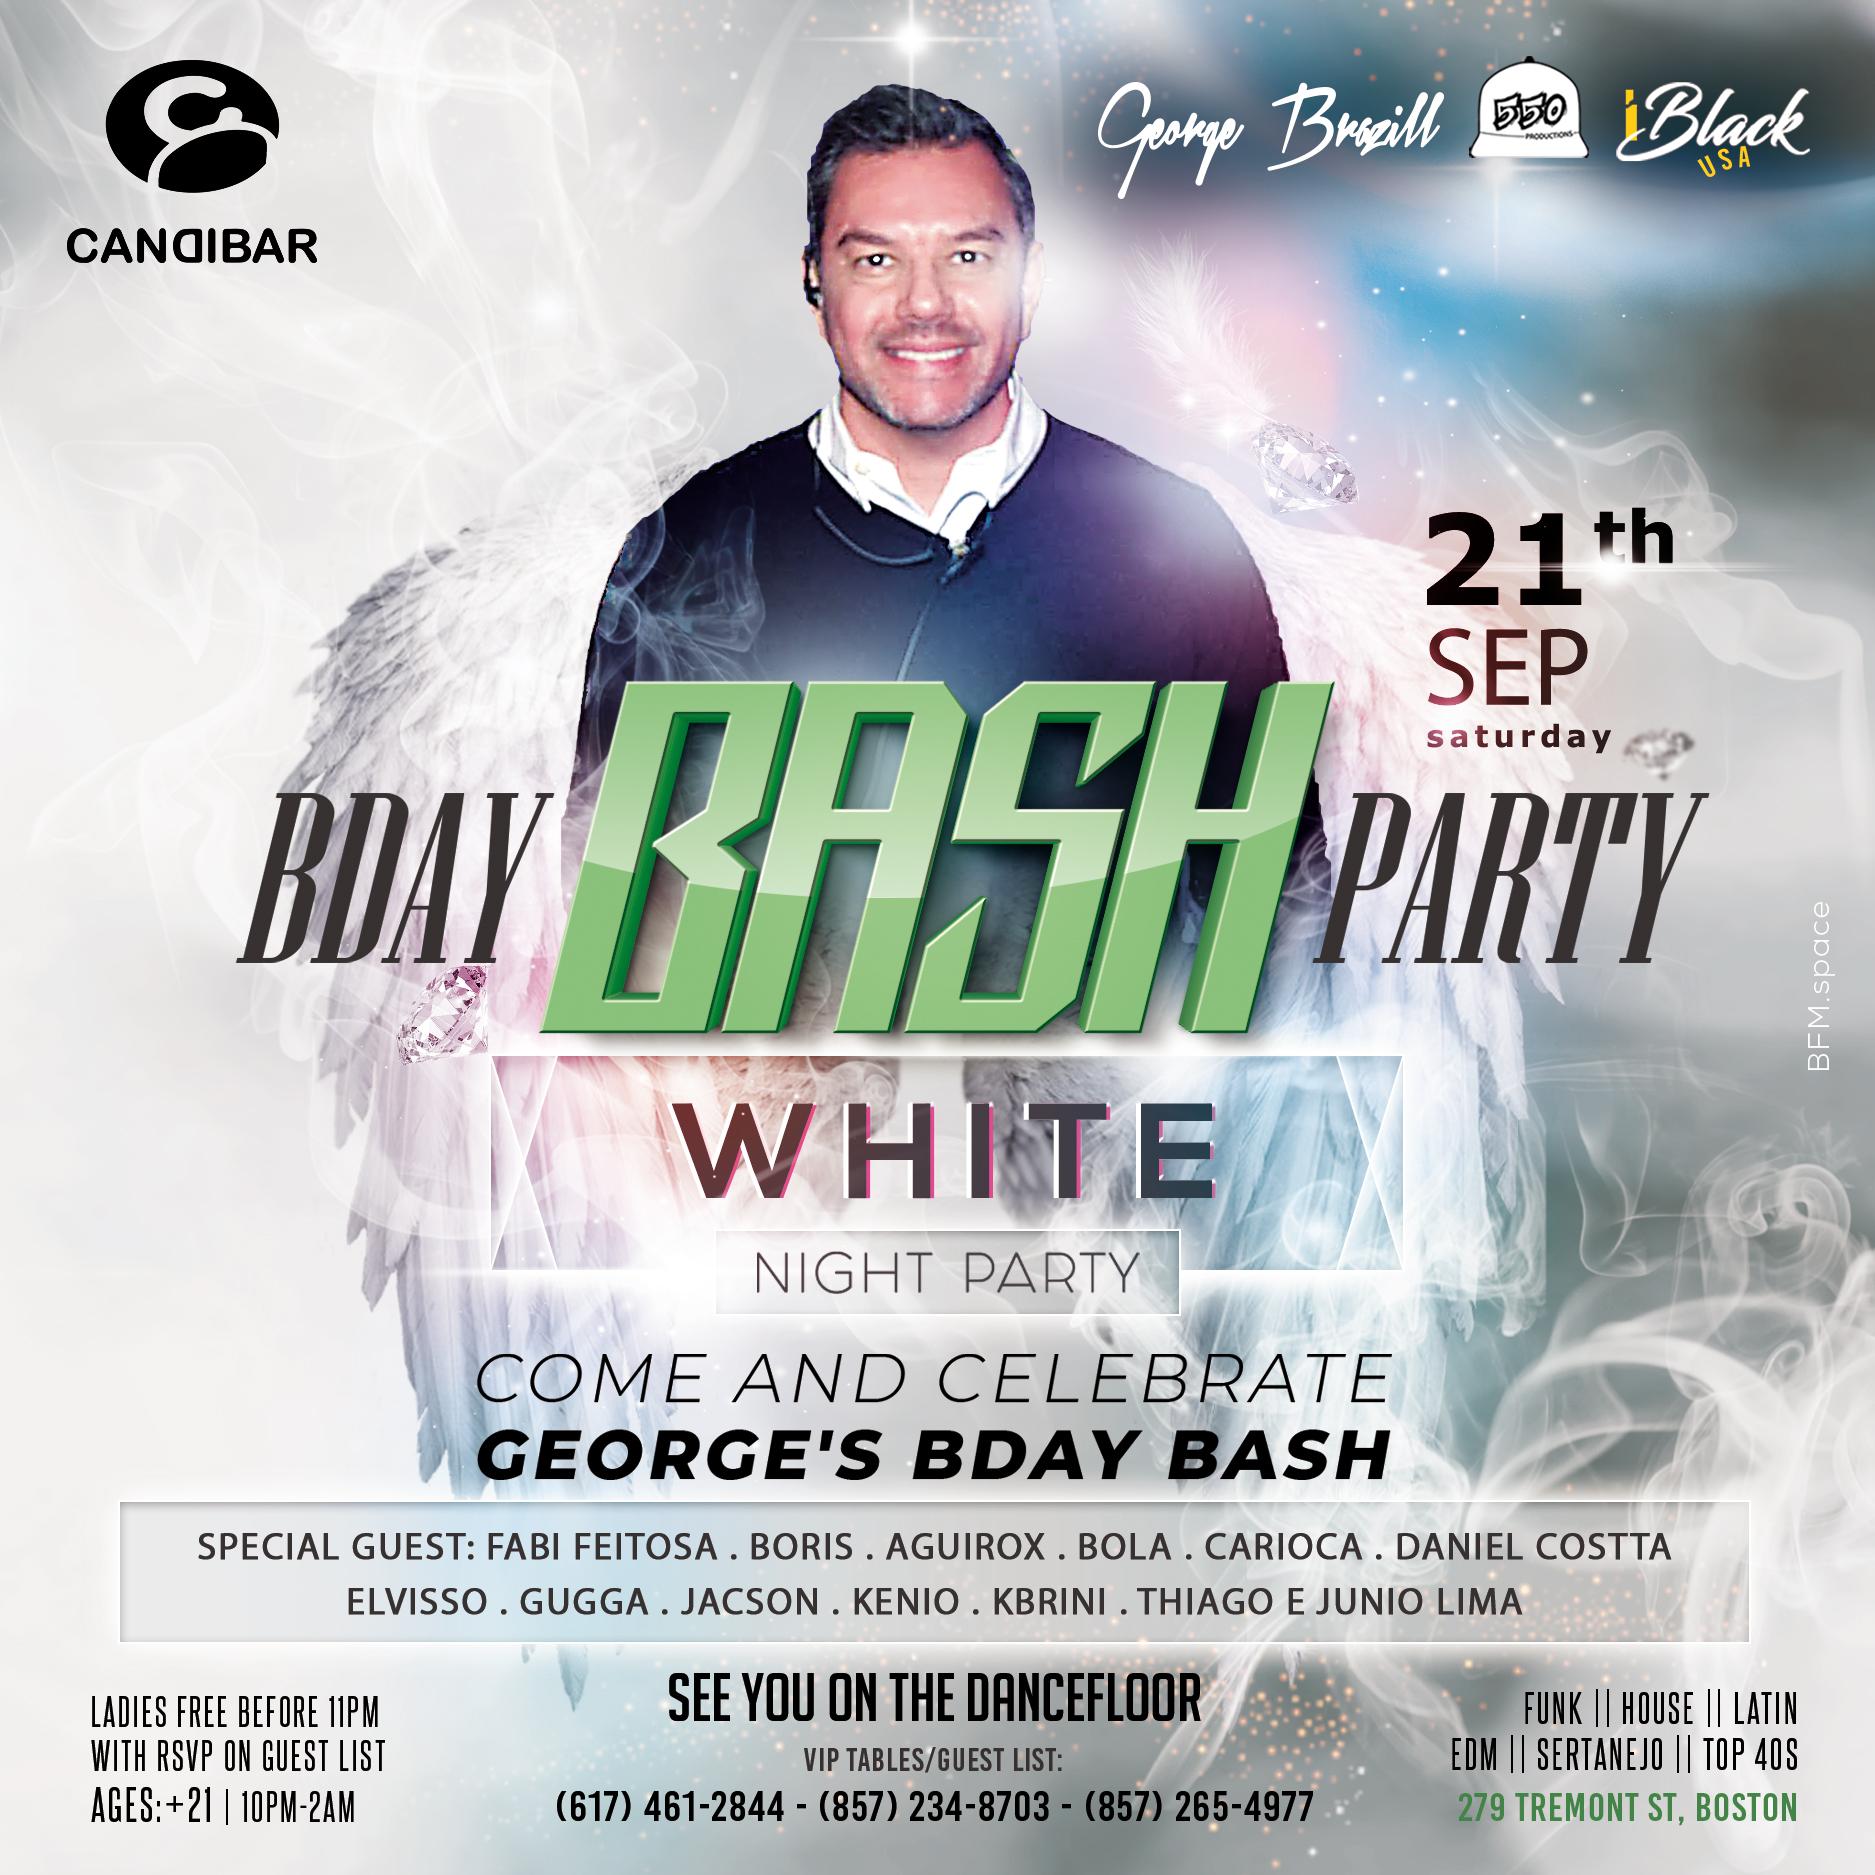 GEORGE'S BDAY BASH WHITE NIGHT PARTY | 21 SET